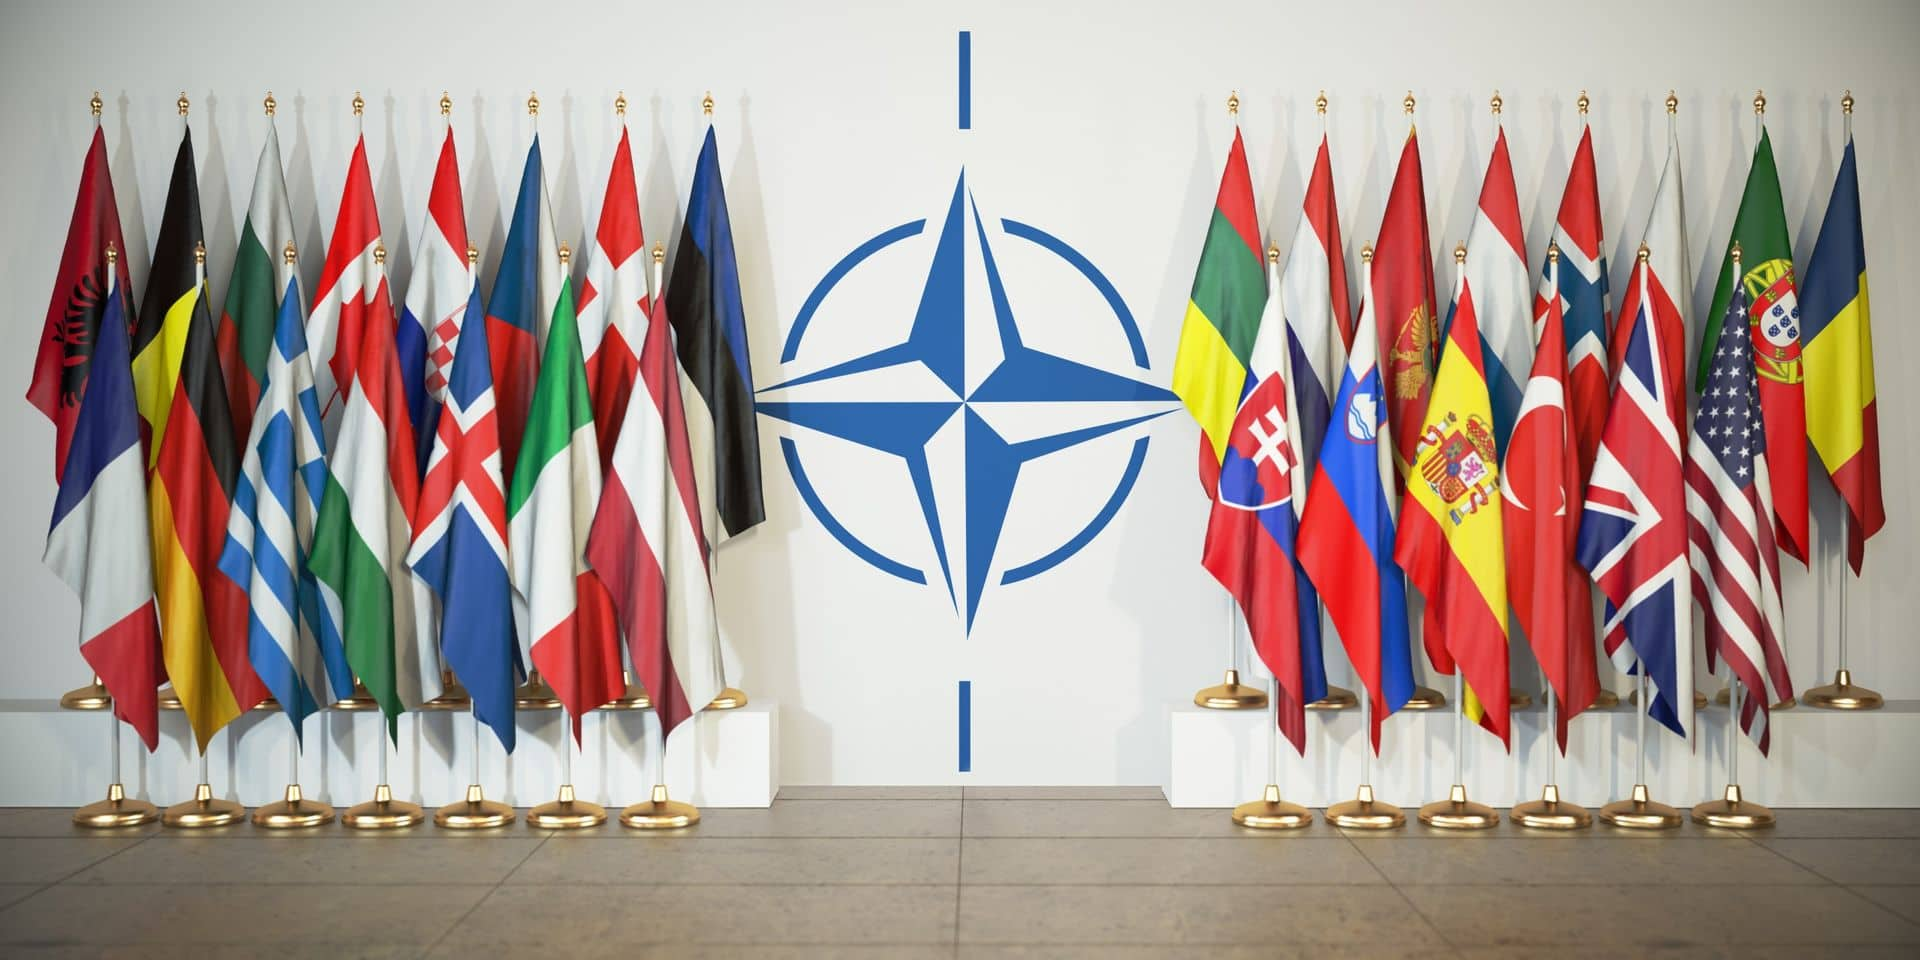 Un sommet de l'Otan aura lieu l'an prochain à Bruxelles